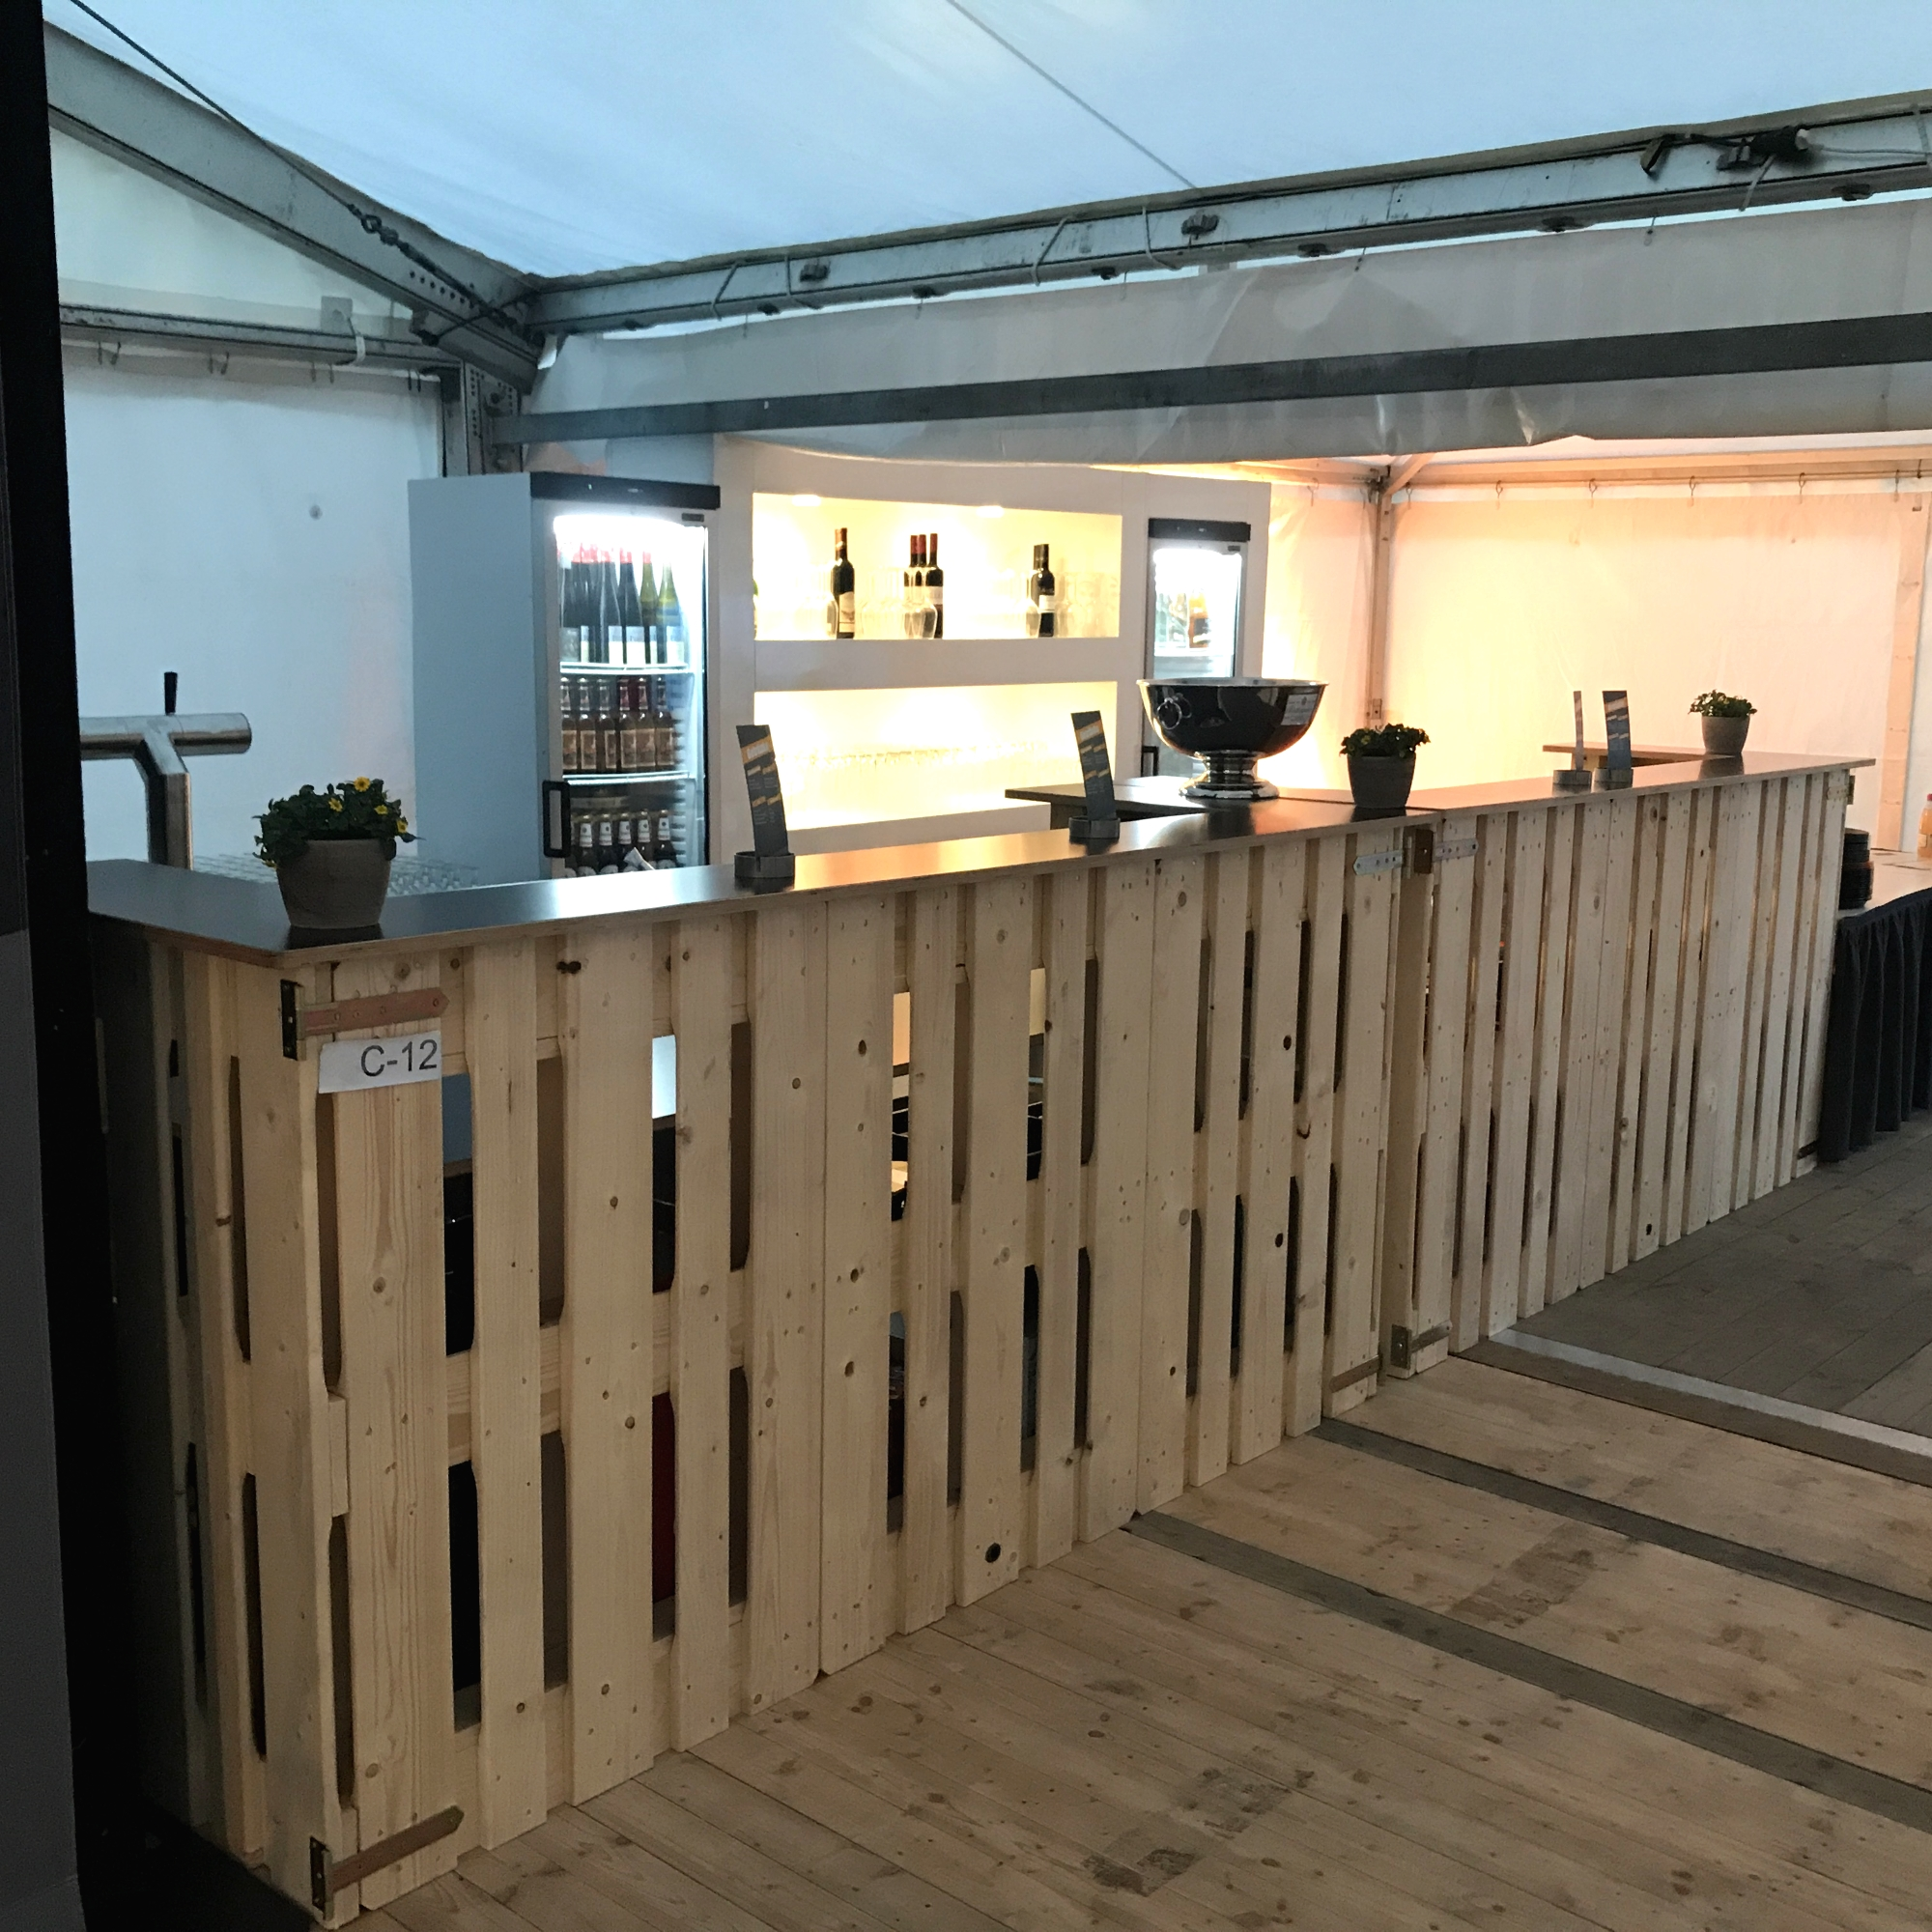 Bars & Tresen aus Paletten mieten - 4 - Palettenmöbel mieten bei SuperSack